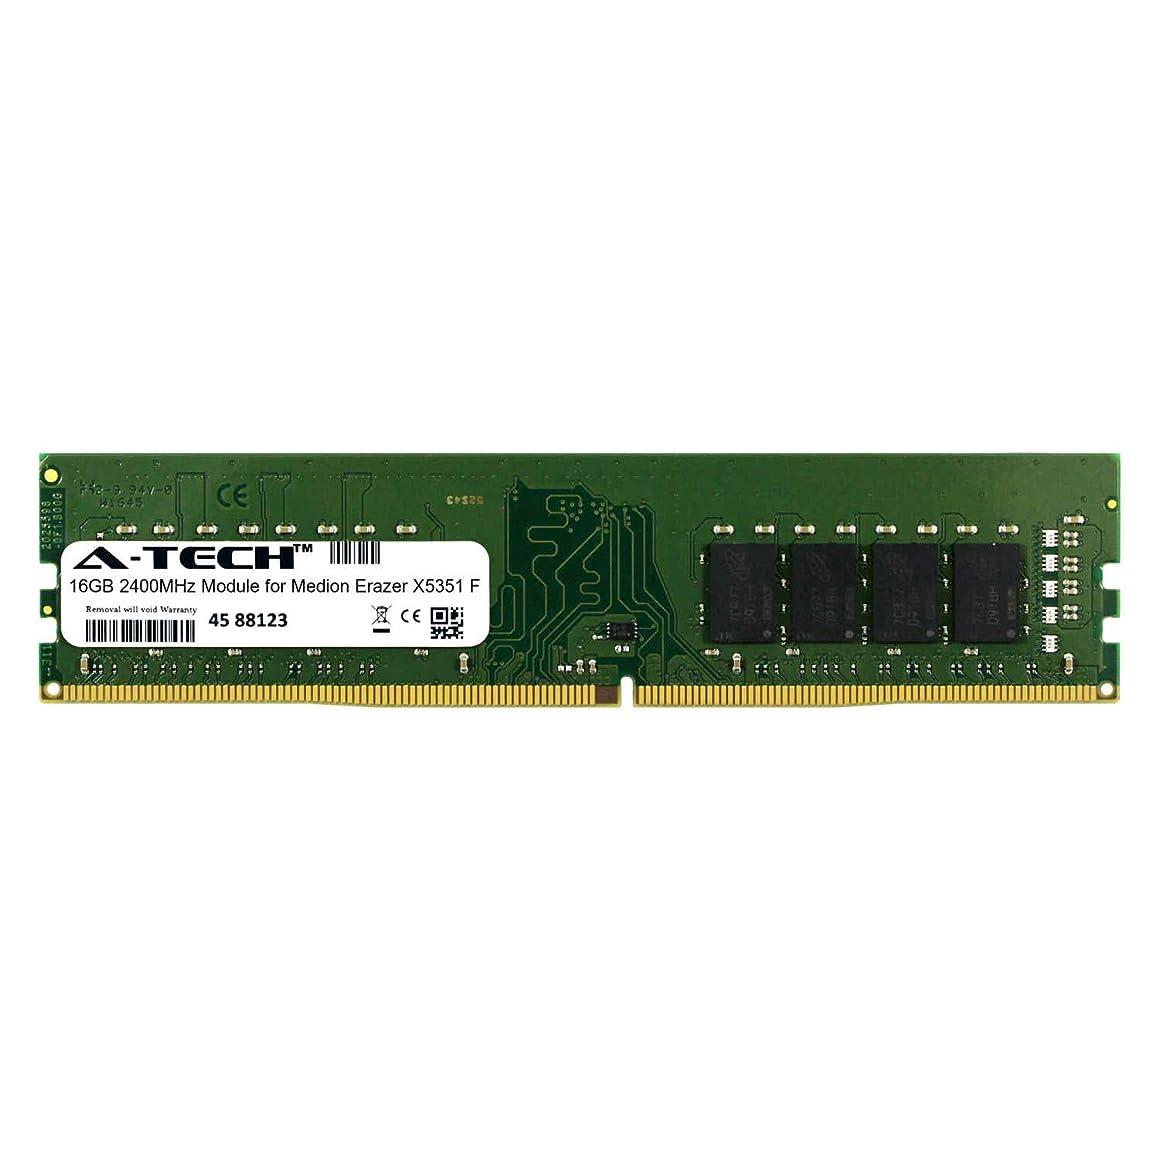 A-Tech 16GB Module for Medion Erazer X5351 F Desktop & Workstation Motherboard Compatible DDR4 2400Mhz Memory Ram (ATMS368845A25822X1)